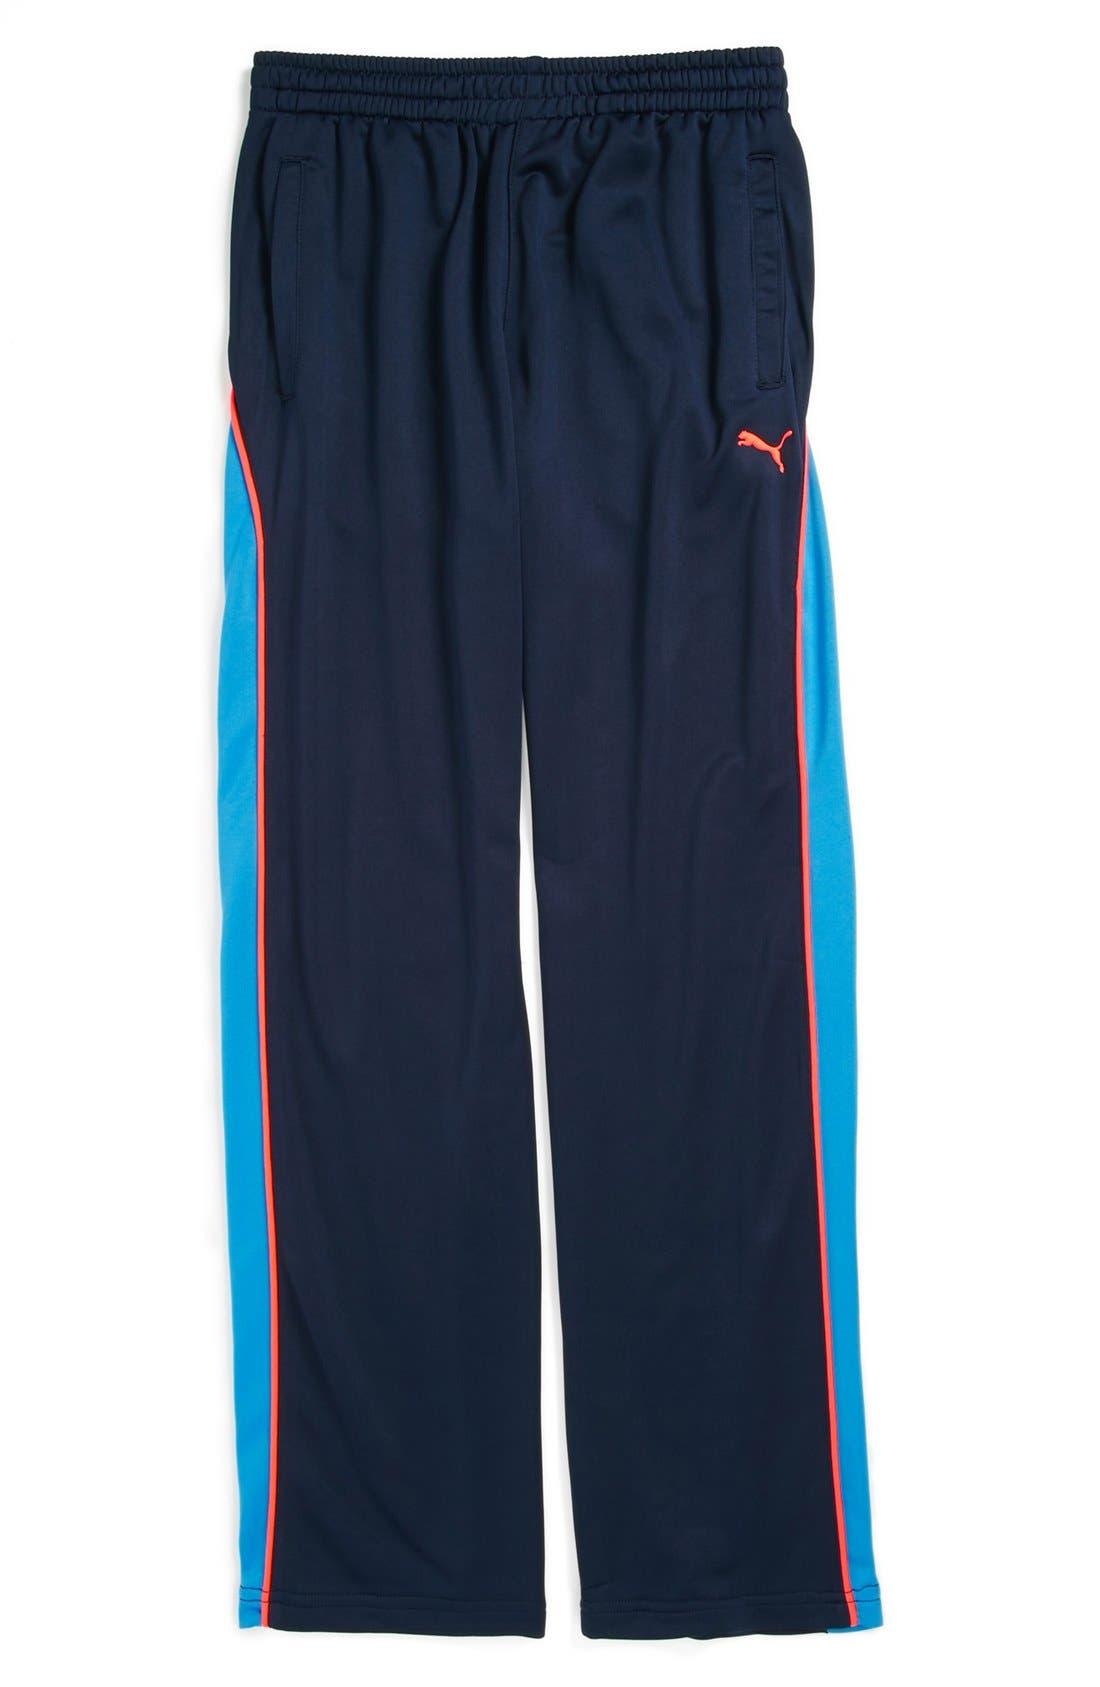 Main Image - PUMA 'Ability' Track Pants (Big Boys)